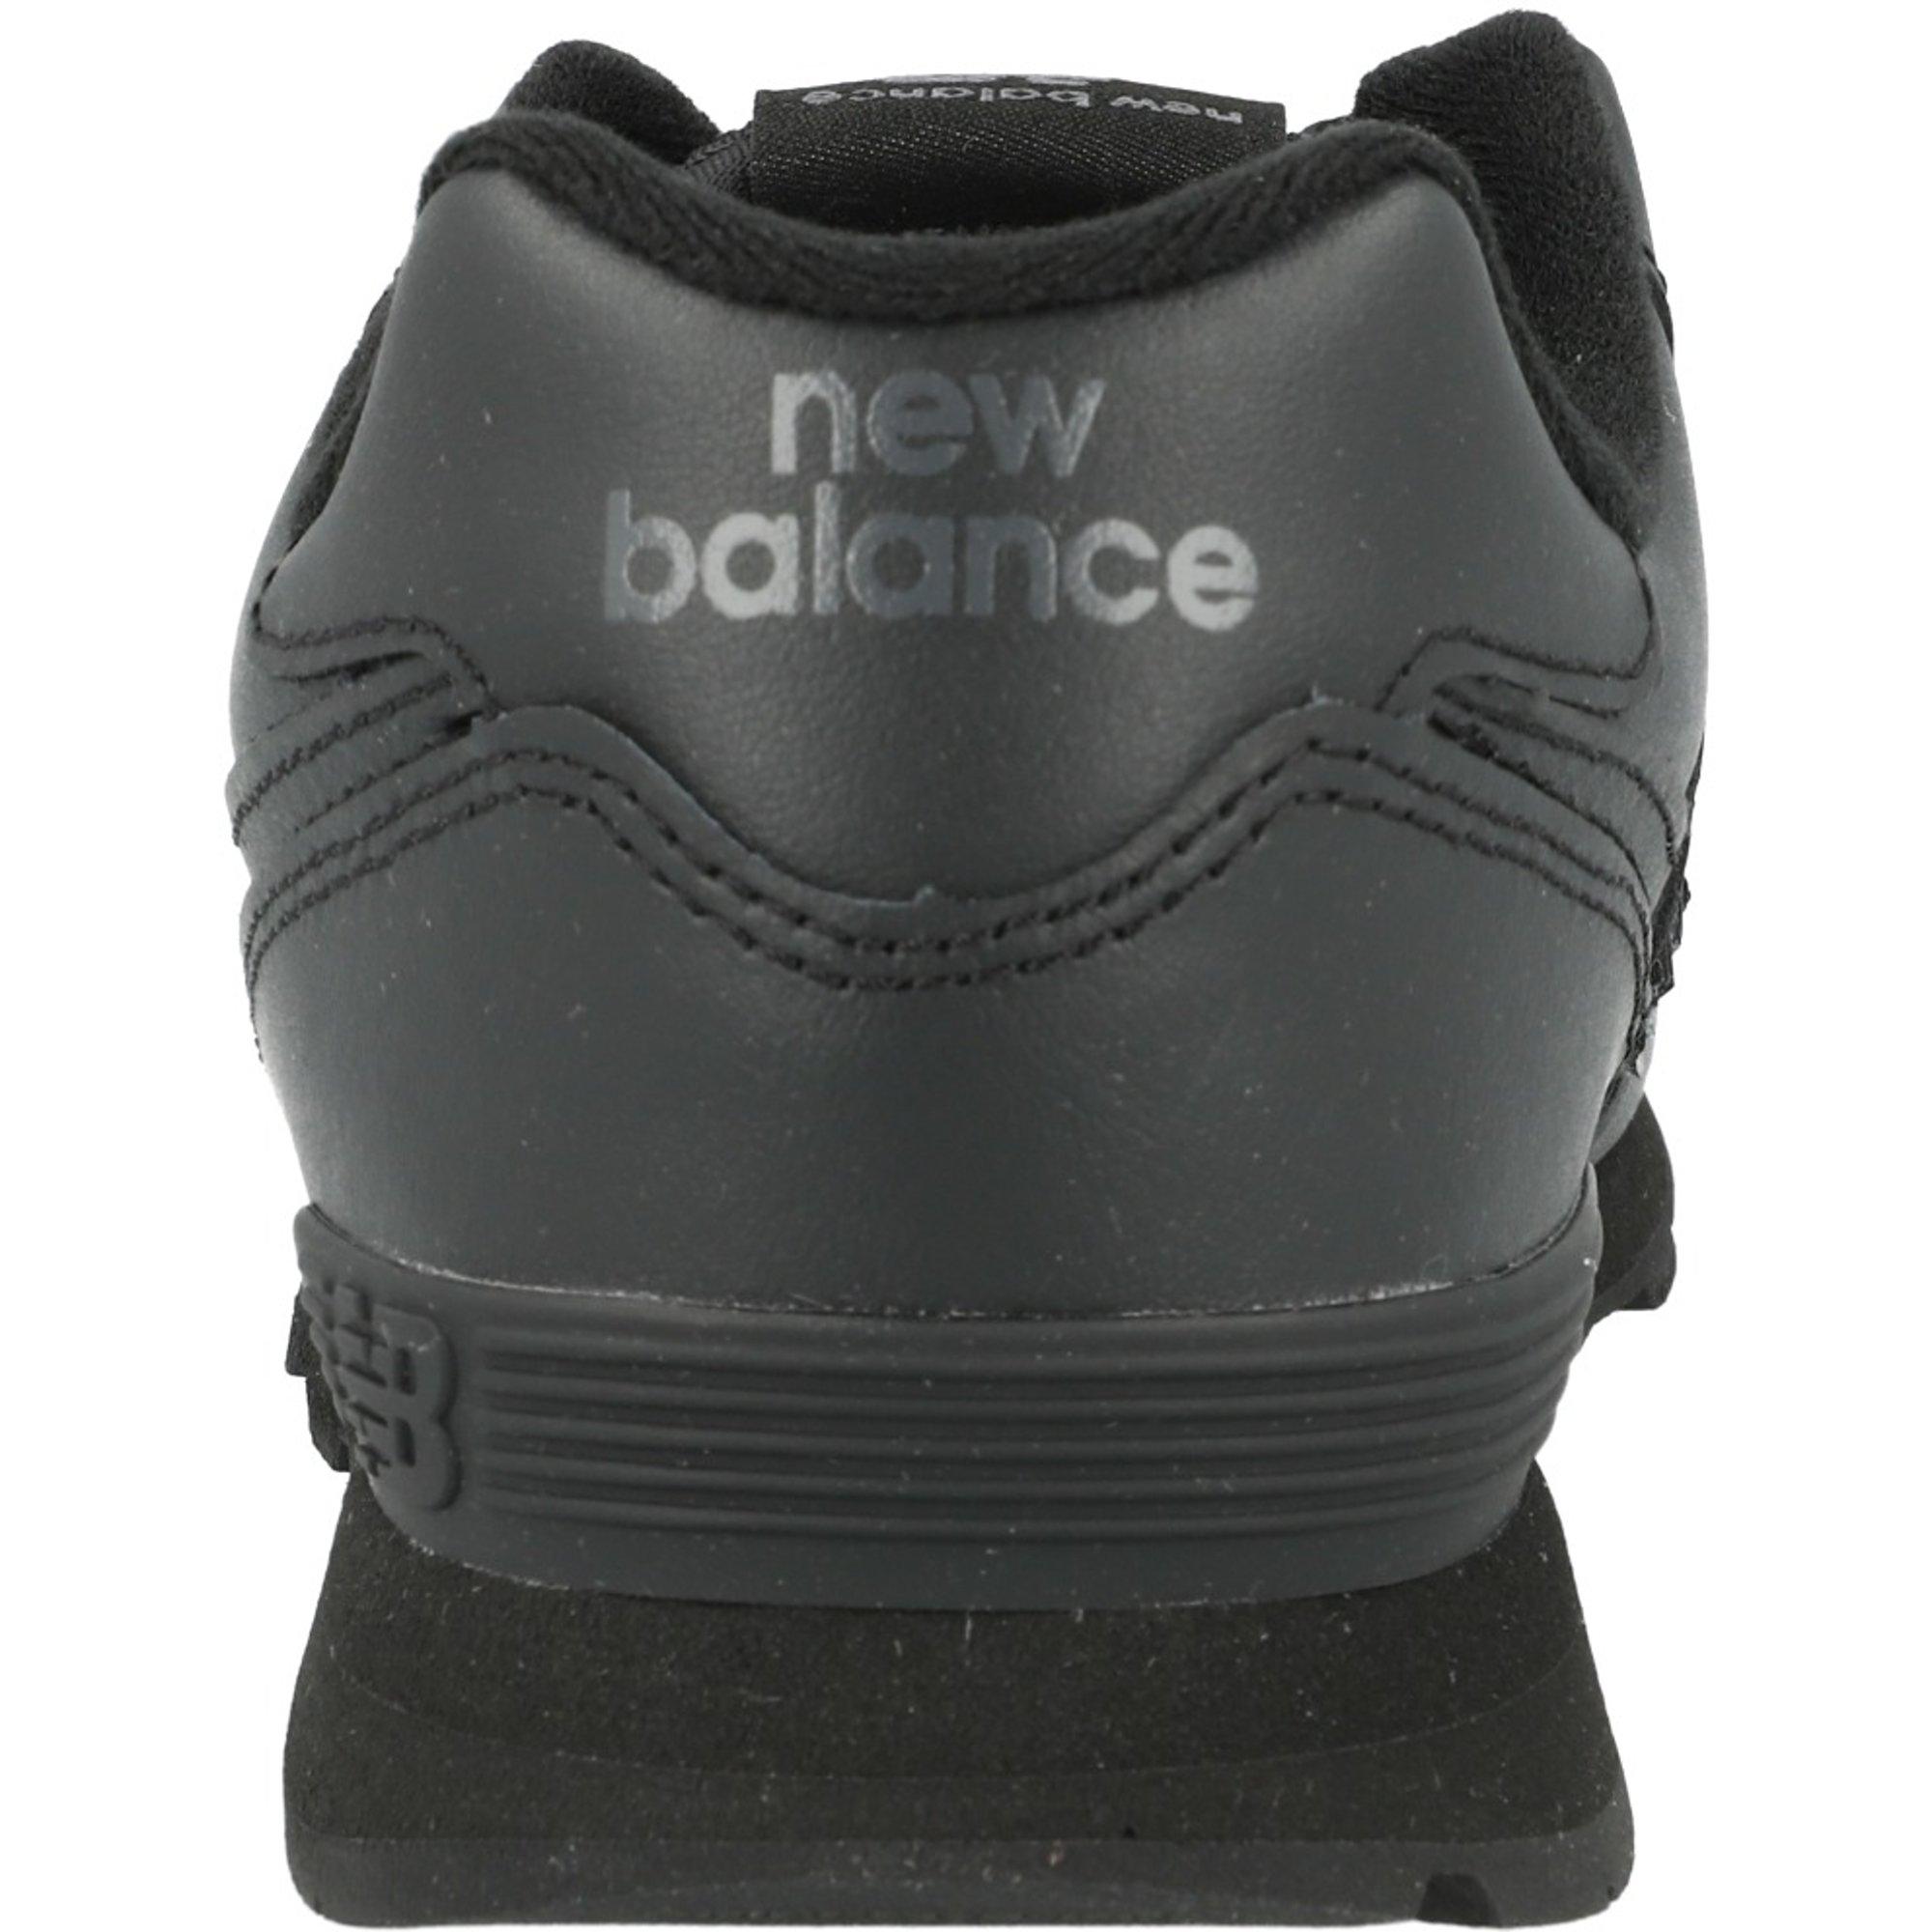 new balance cuero negro